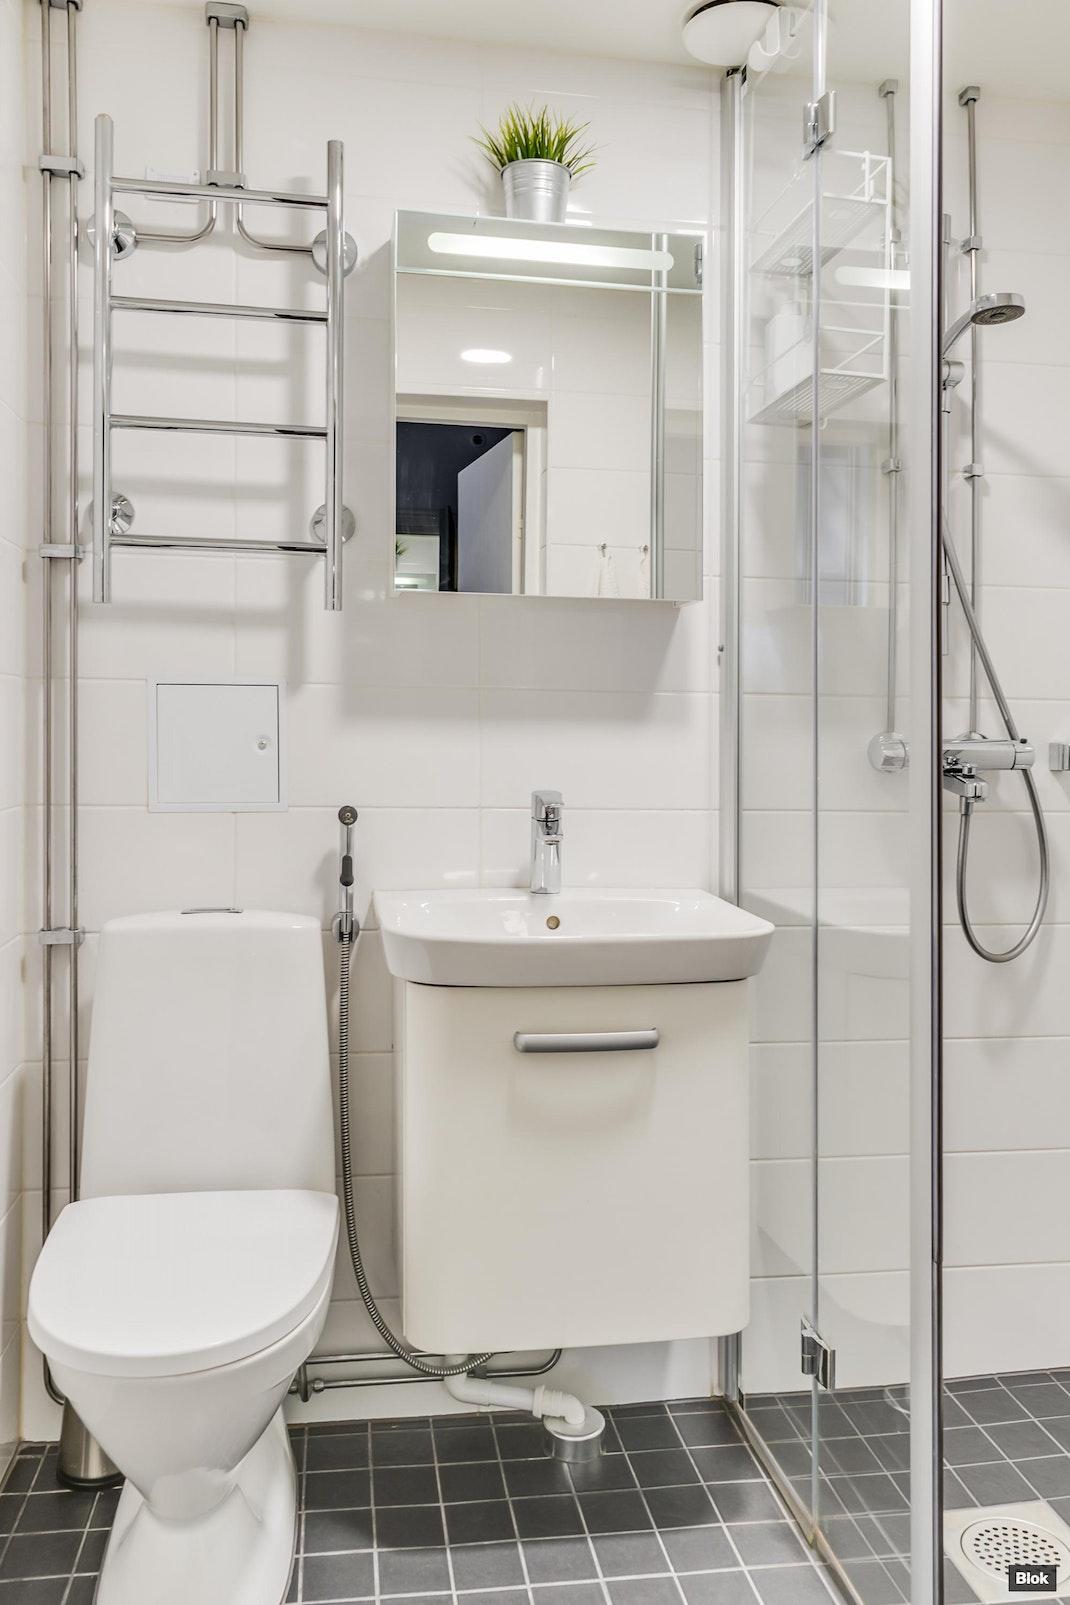 Katajaharjuntie 6 B 18 Kylpyhuone